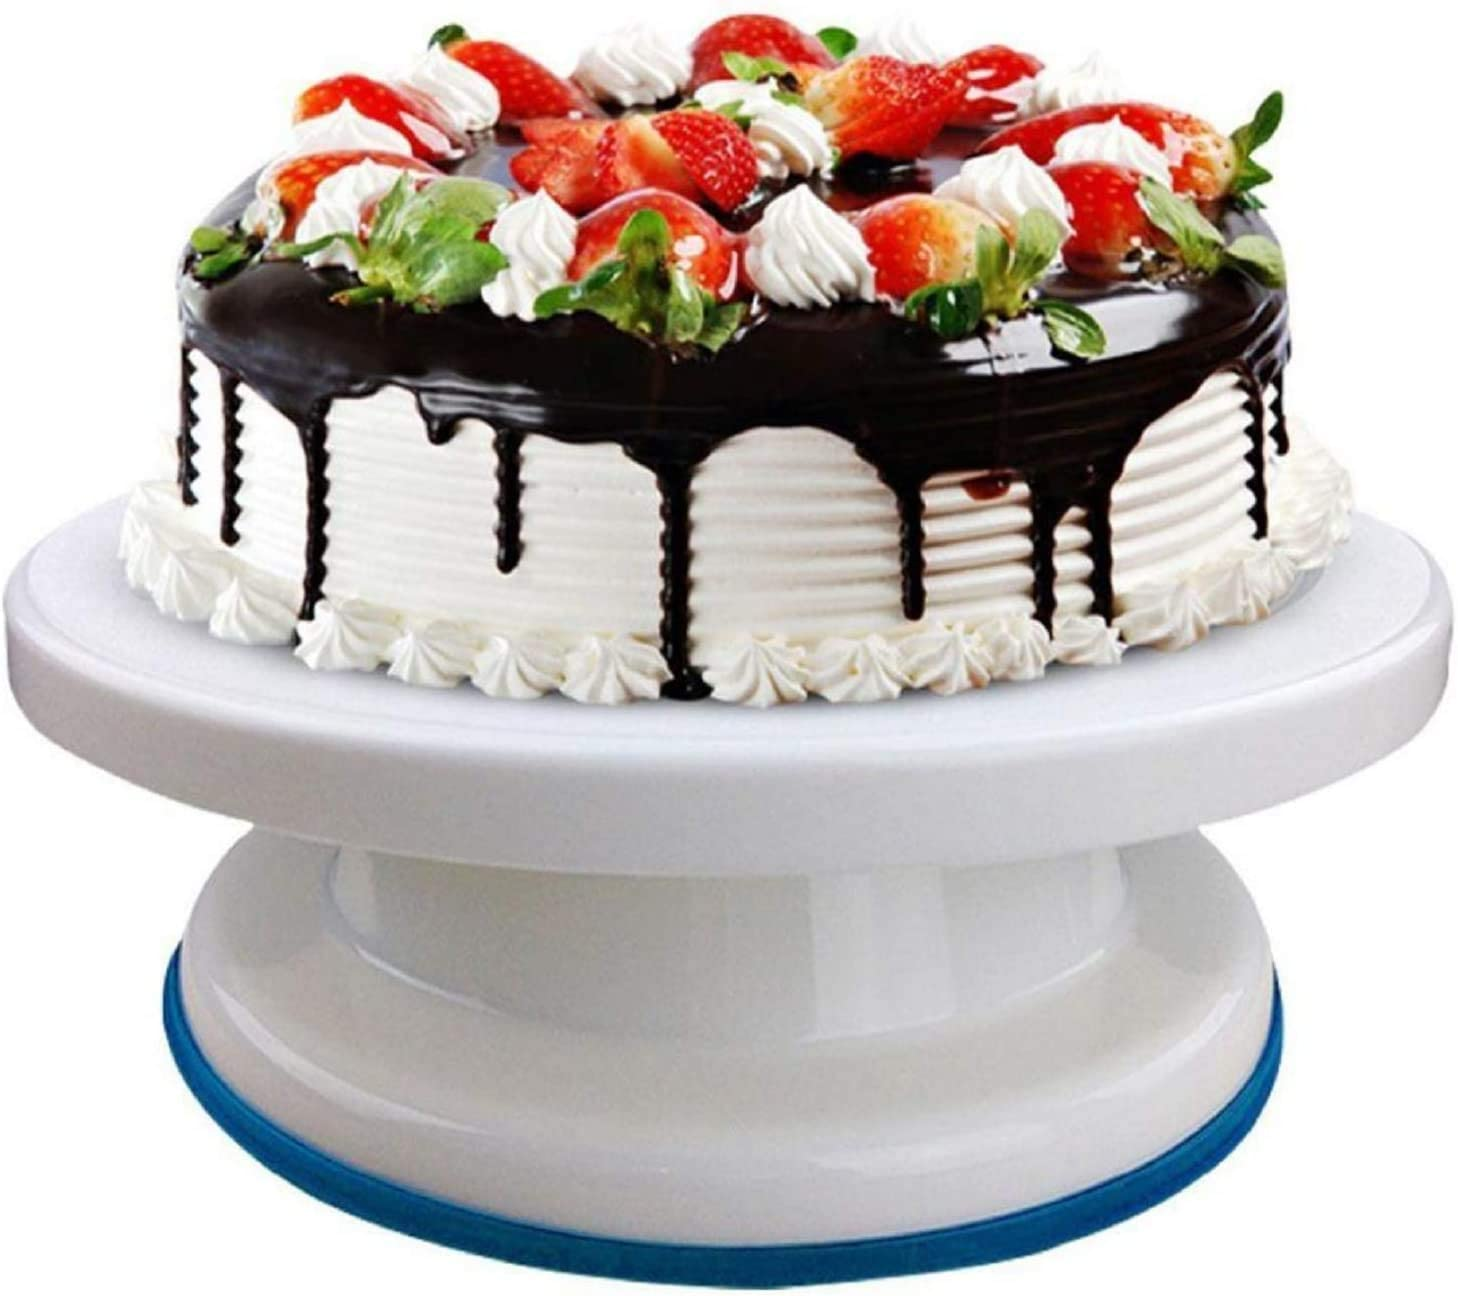 Turntable Cake Decorating Rotating Stand DIY Cake Rack Baking Tool H1